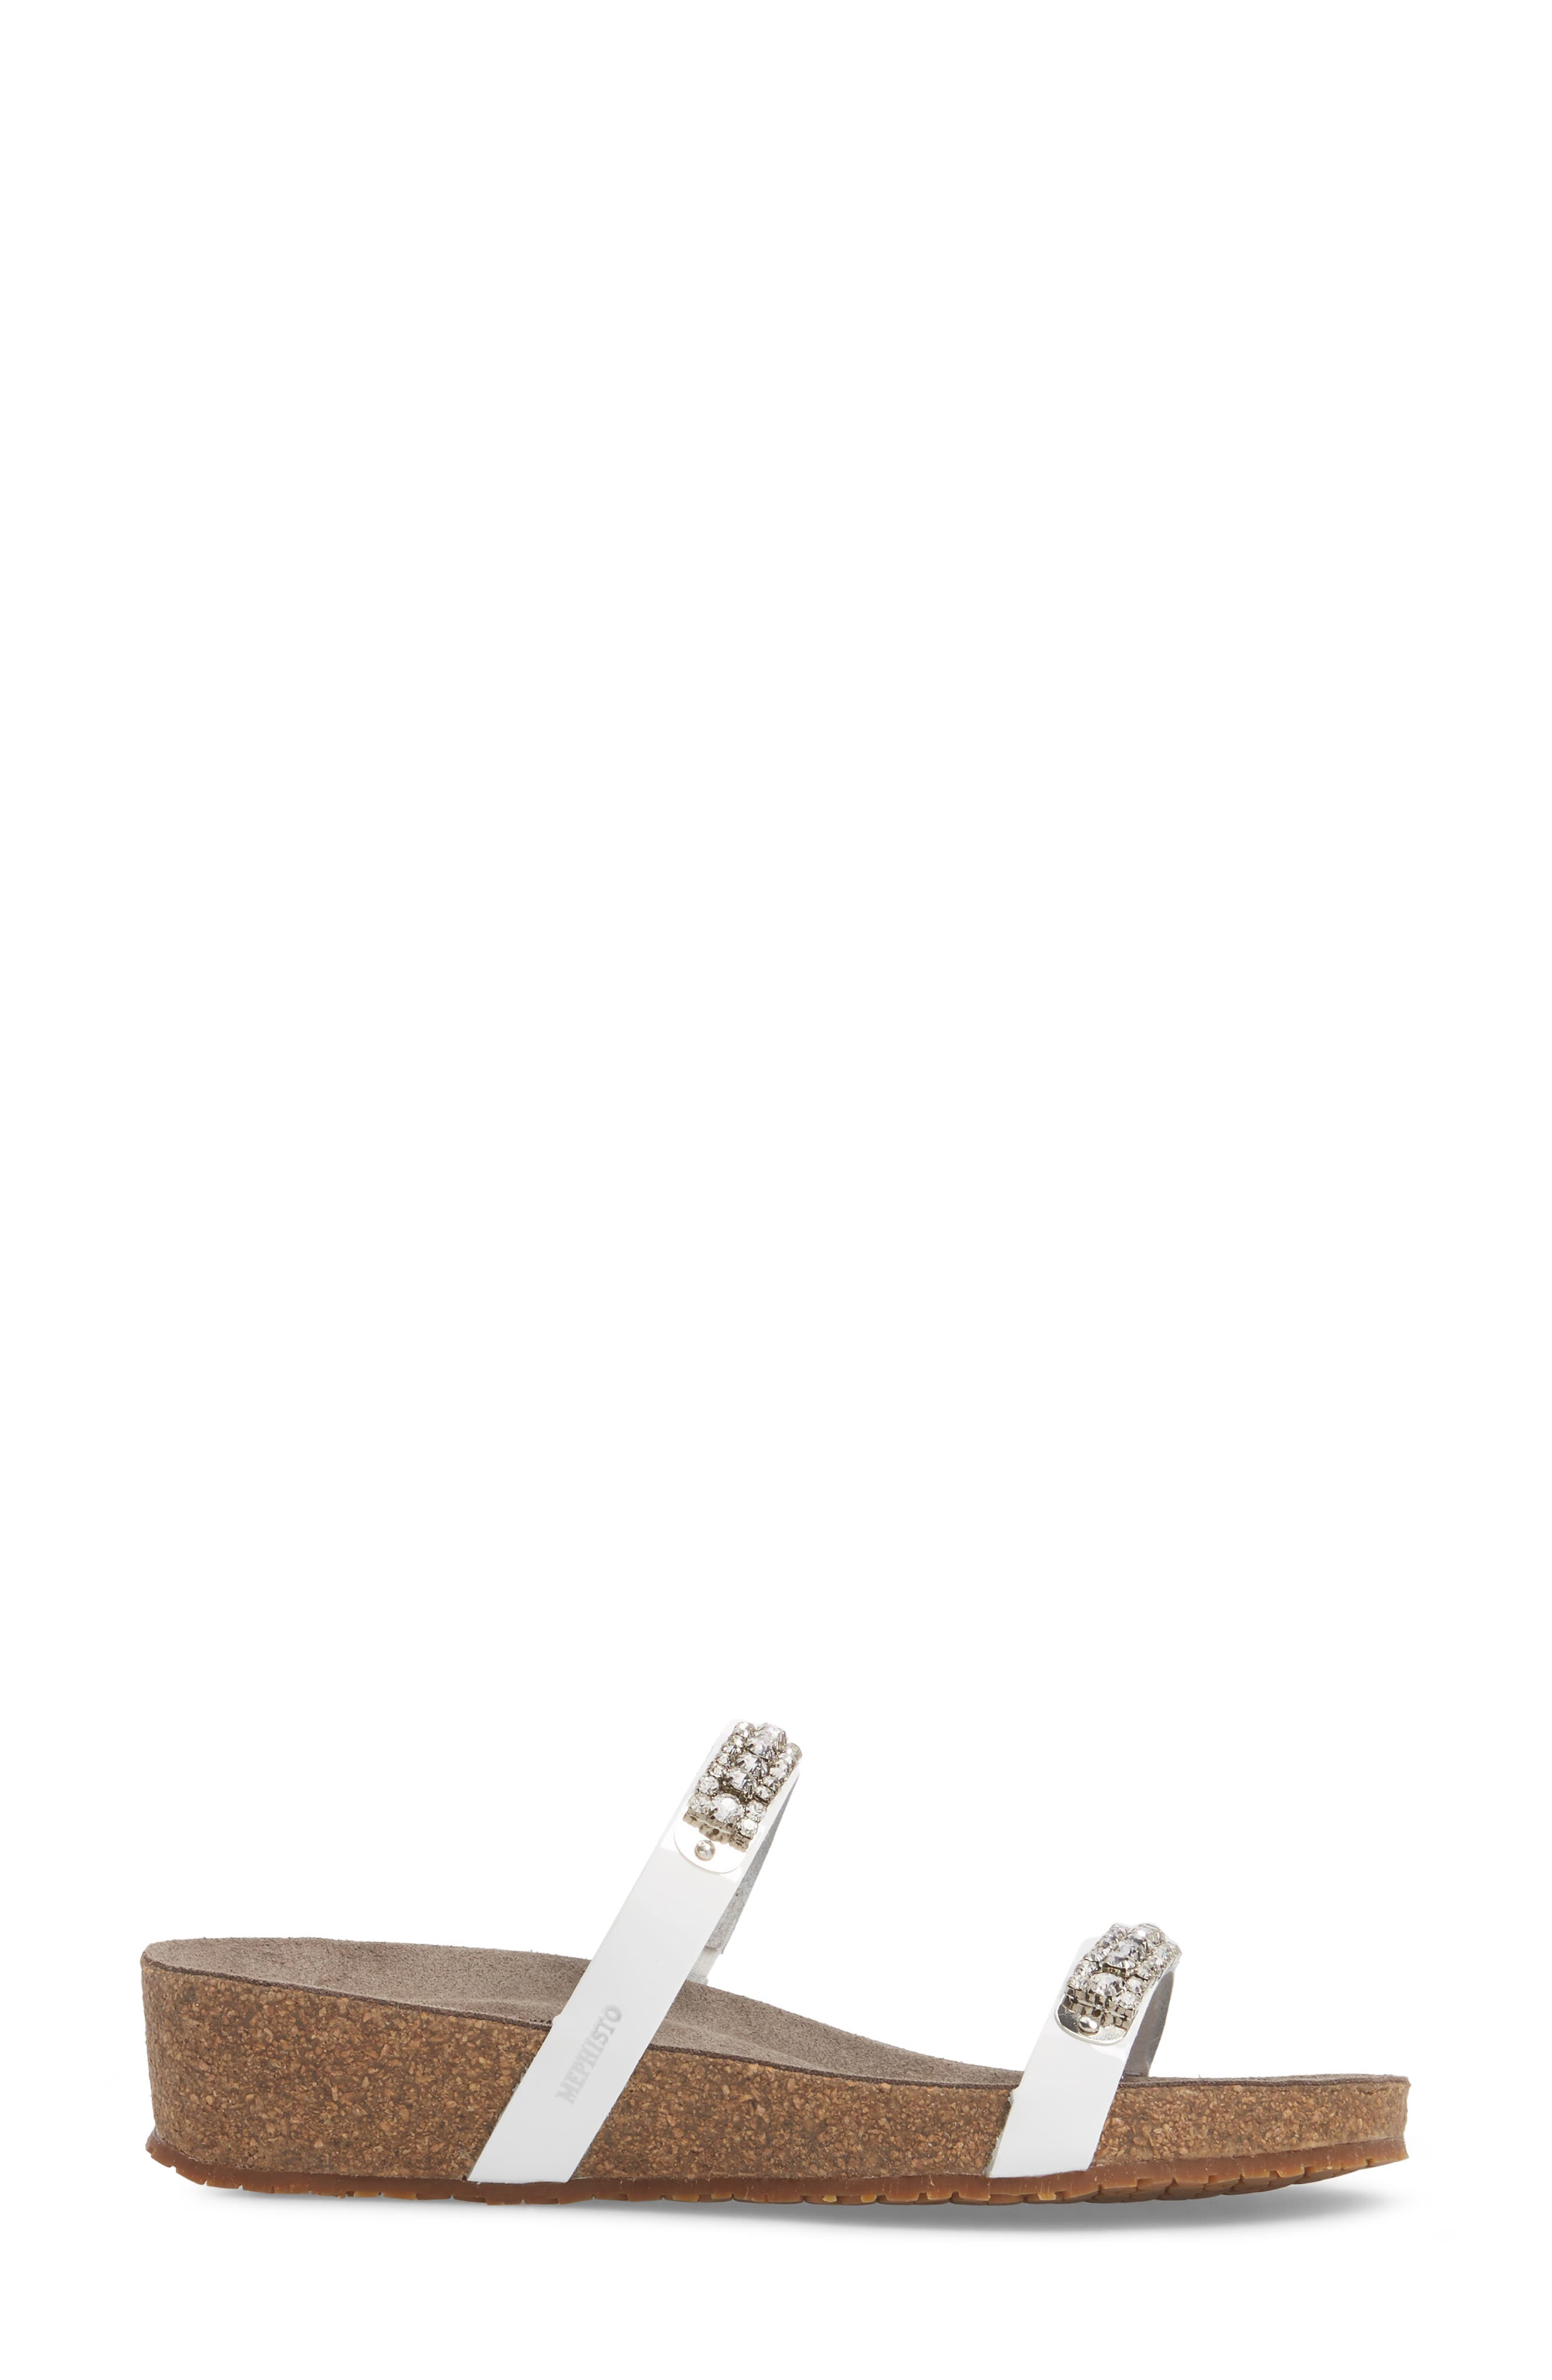 'Ivana' Crystal Embellished Slide Sandal,                             Alternate thumbnail 3, color,                             White Patent